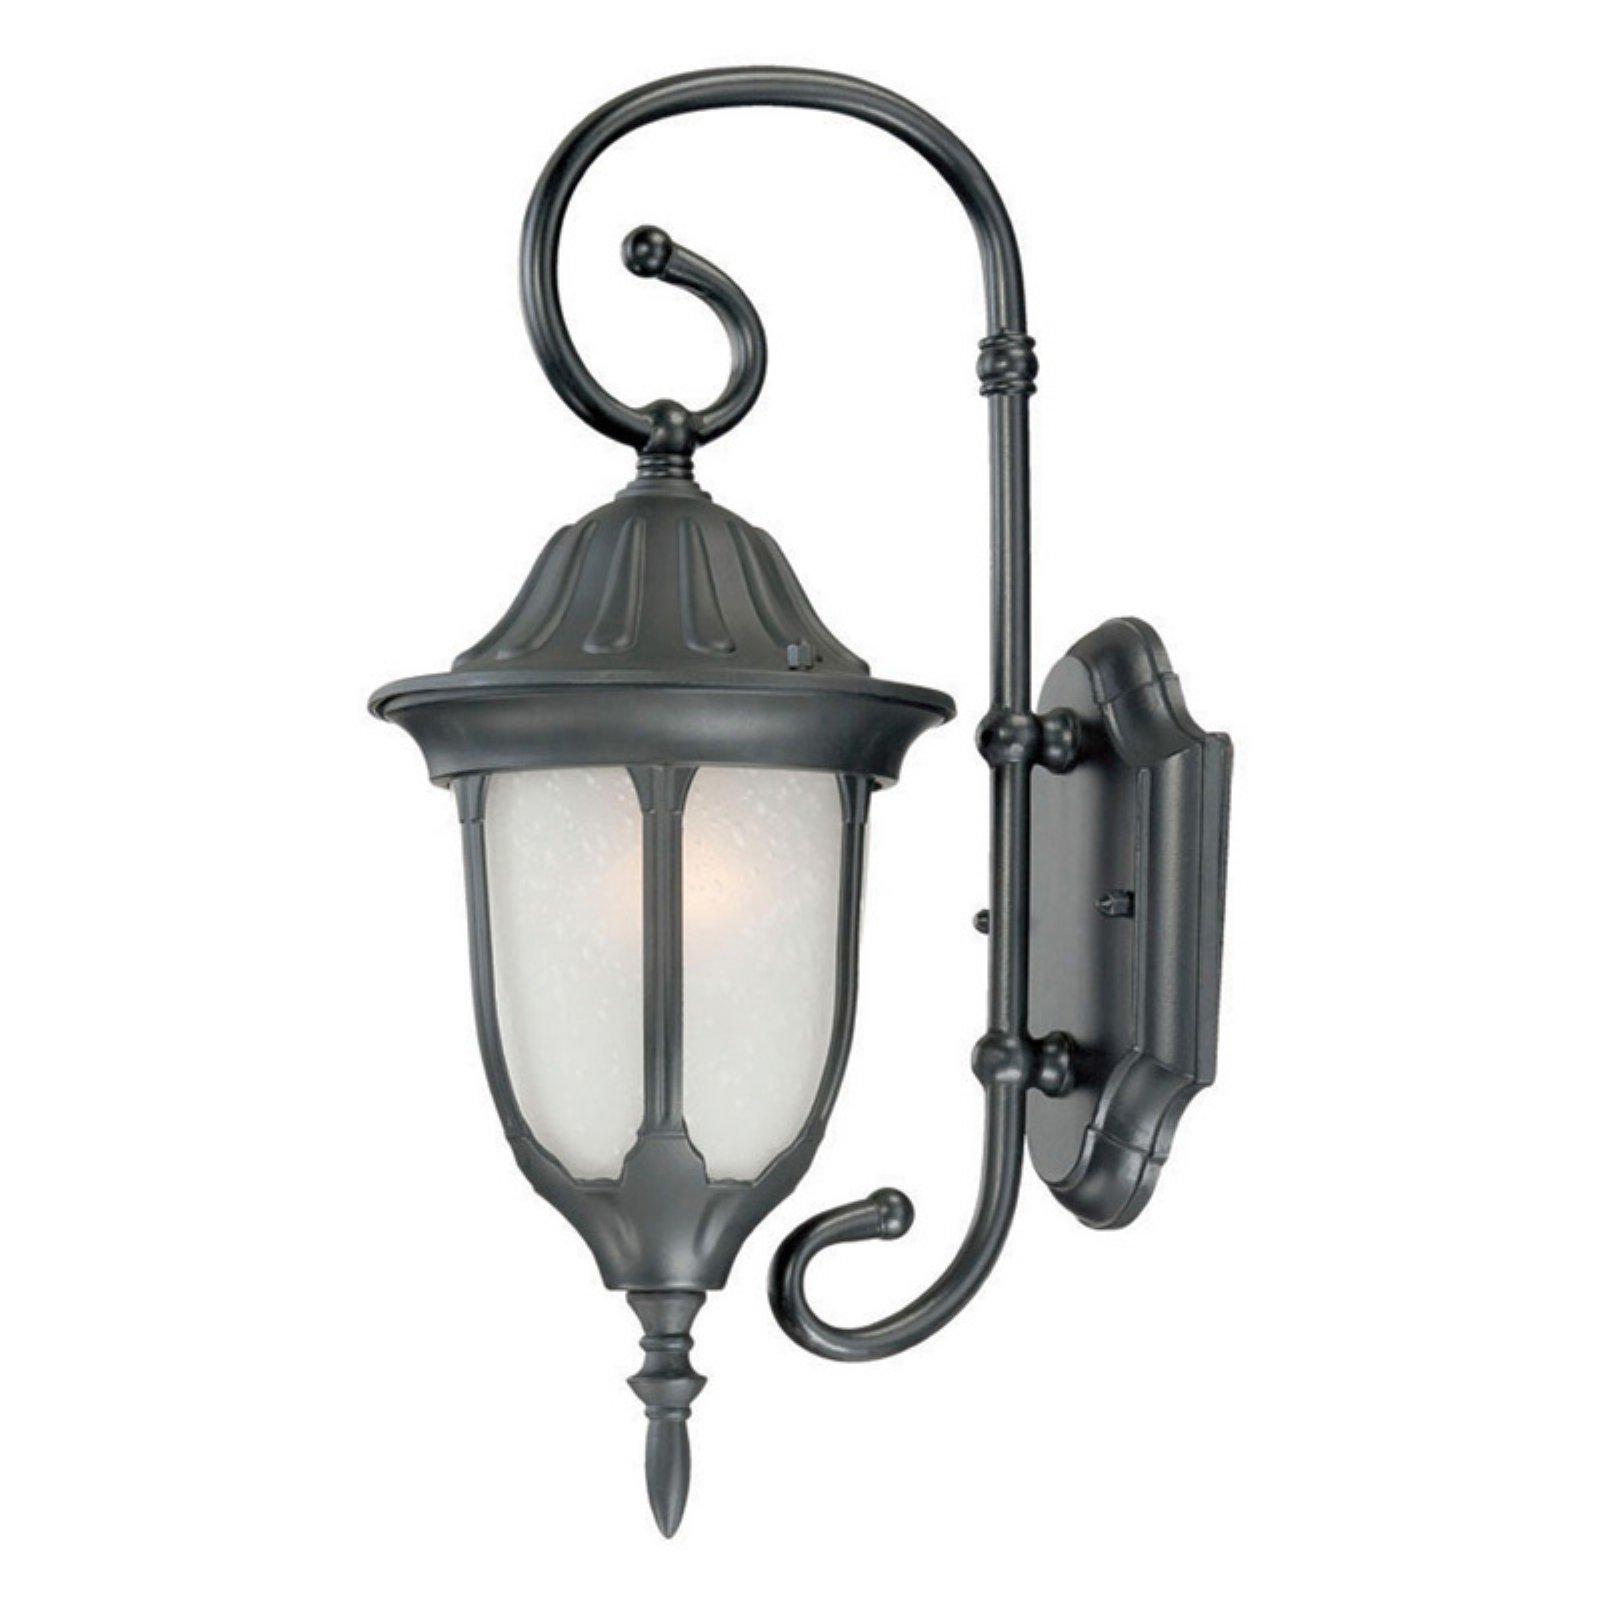 Acclaim Lighting Suffolk 6.5 in. Outdoor Wall Mount Light Fixture